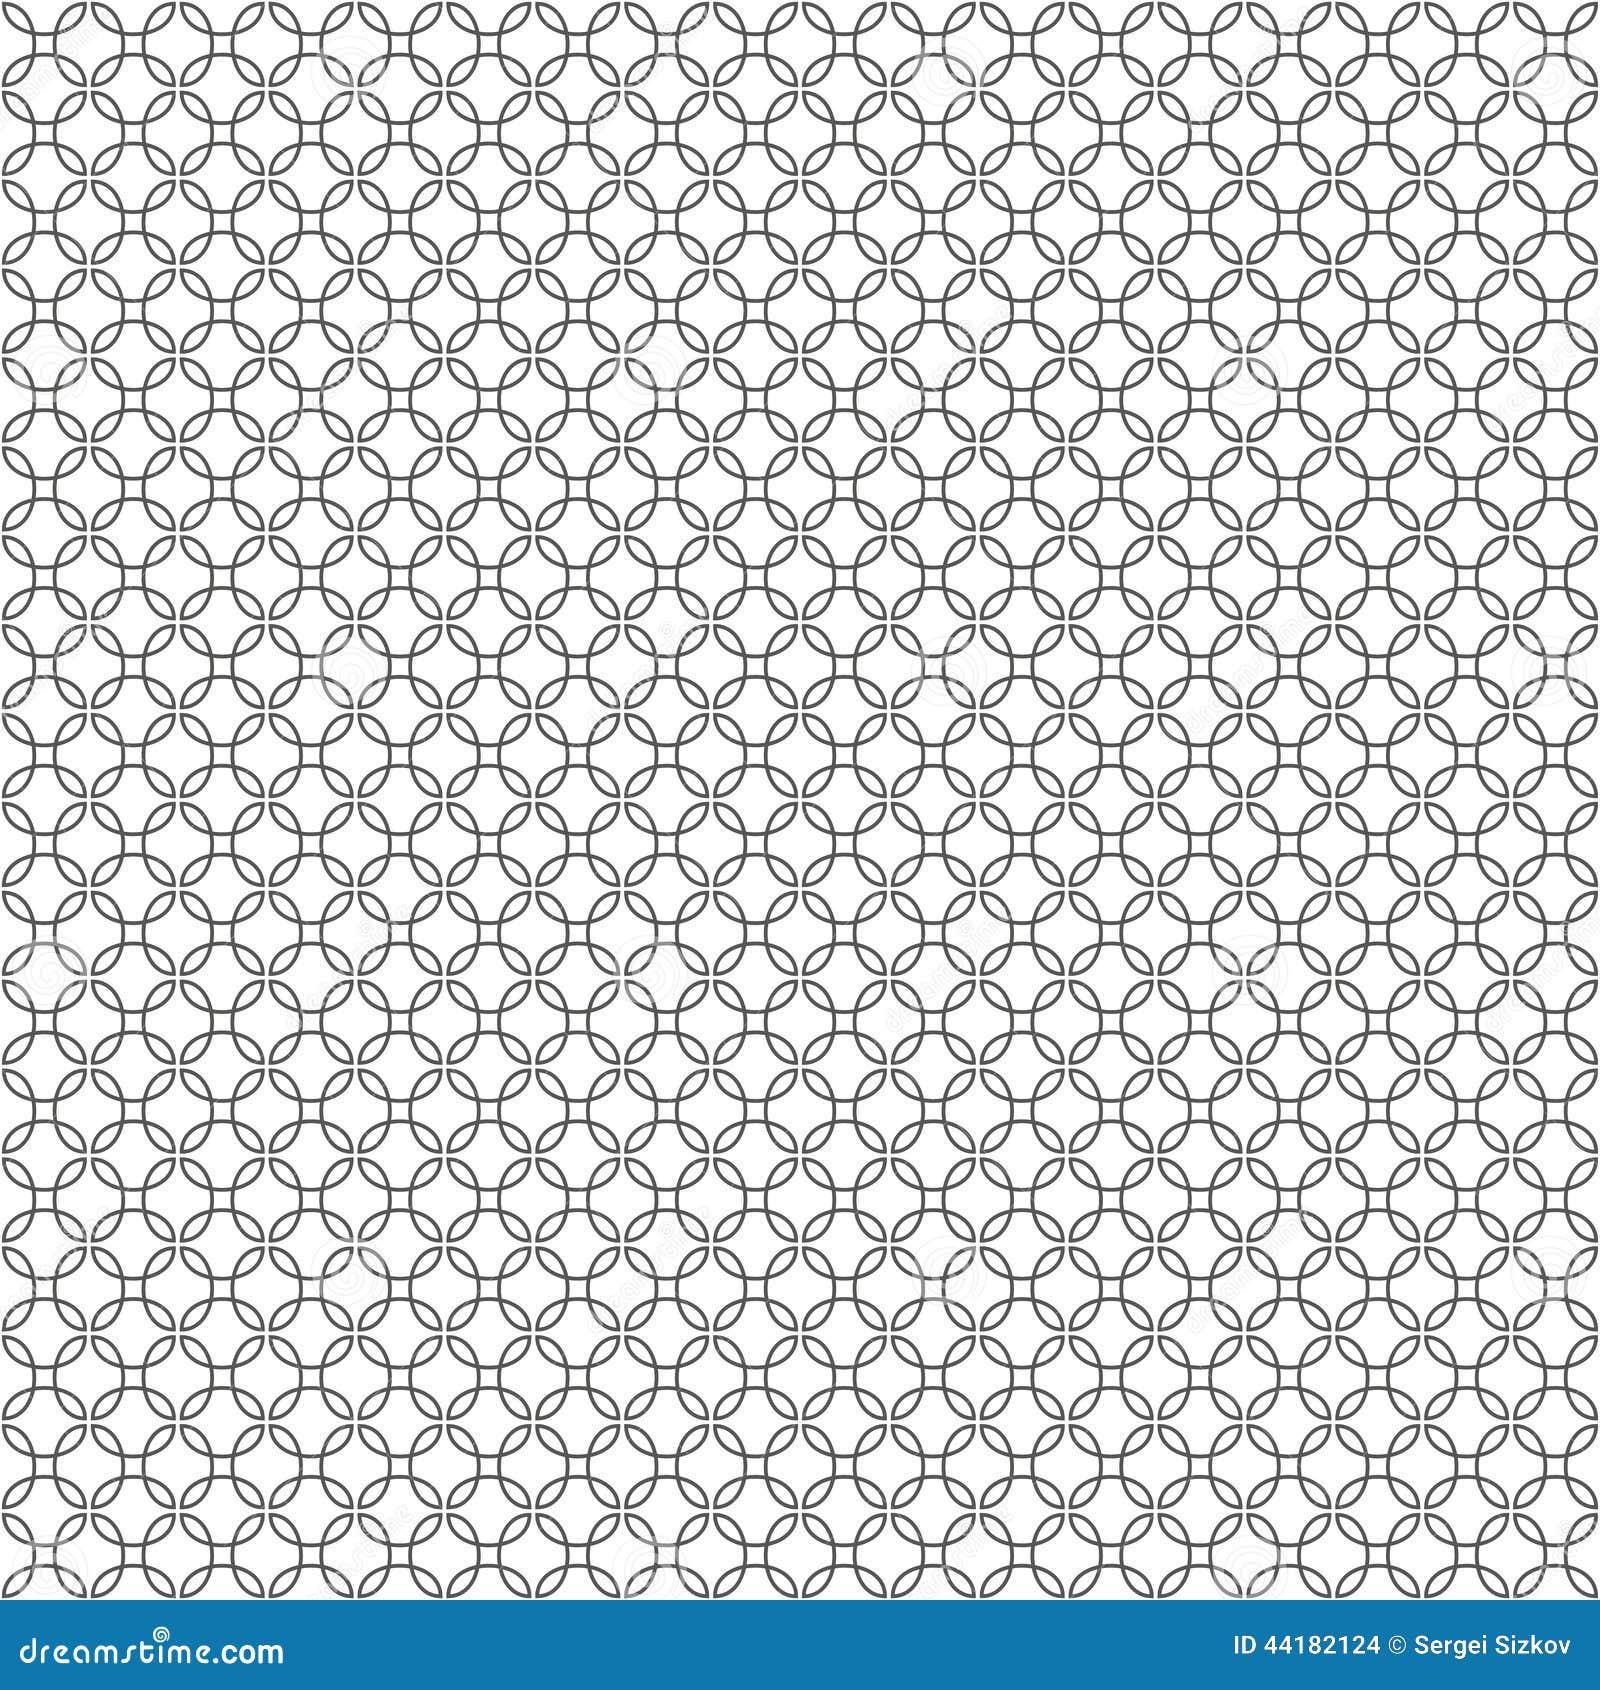 nahtlose matratzebeschaffenheit kinder bett nahtloser verdrahteter zaun vektorhintergrundbeschaffenheit verdrahteter vektor